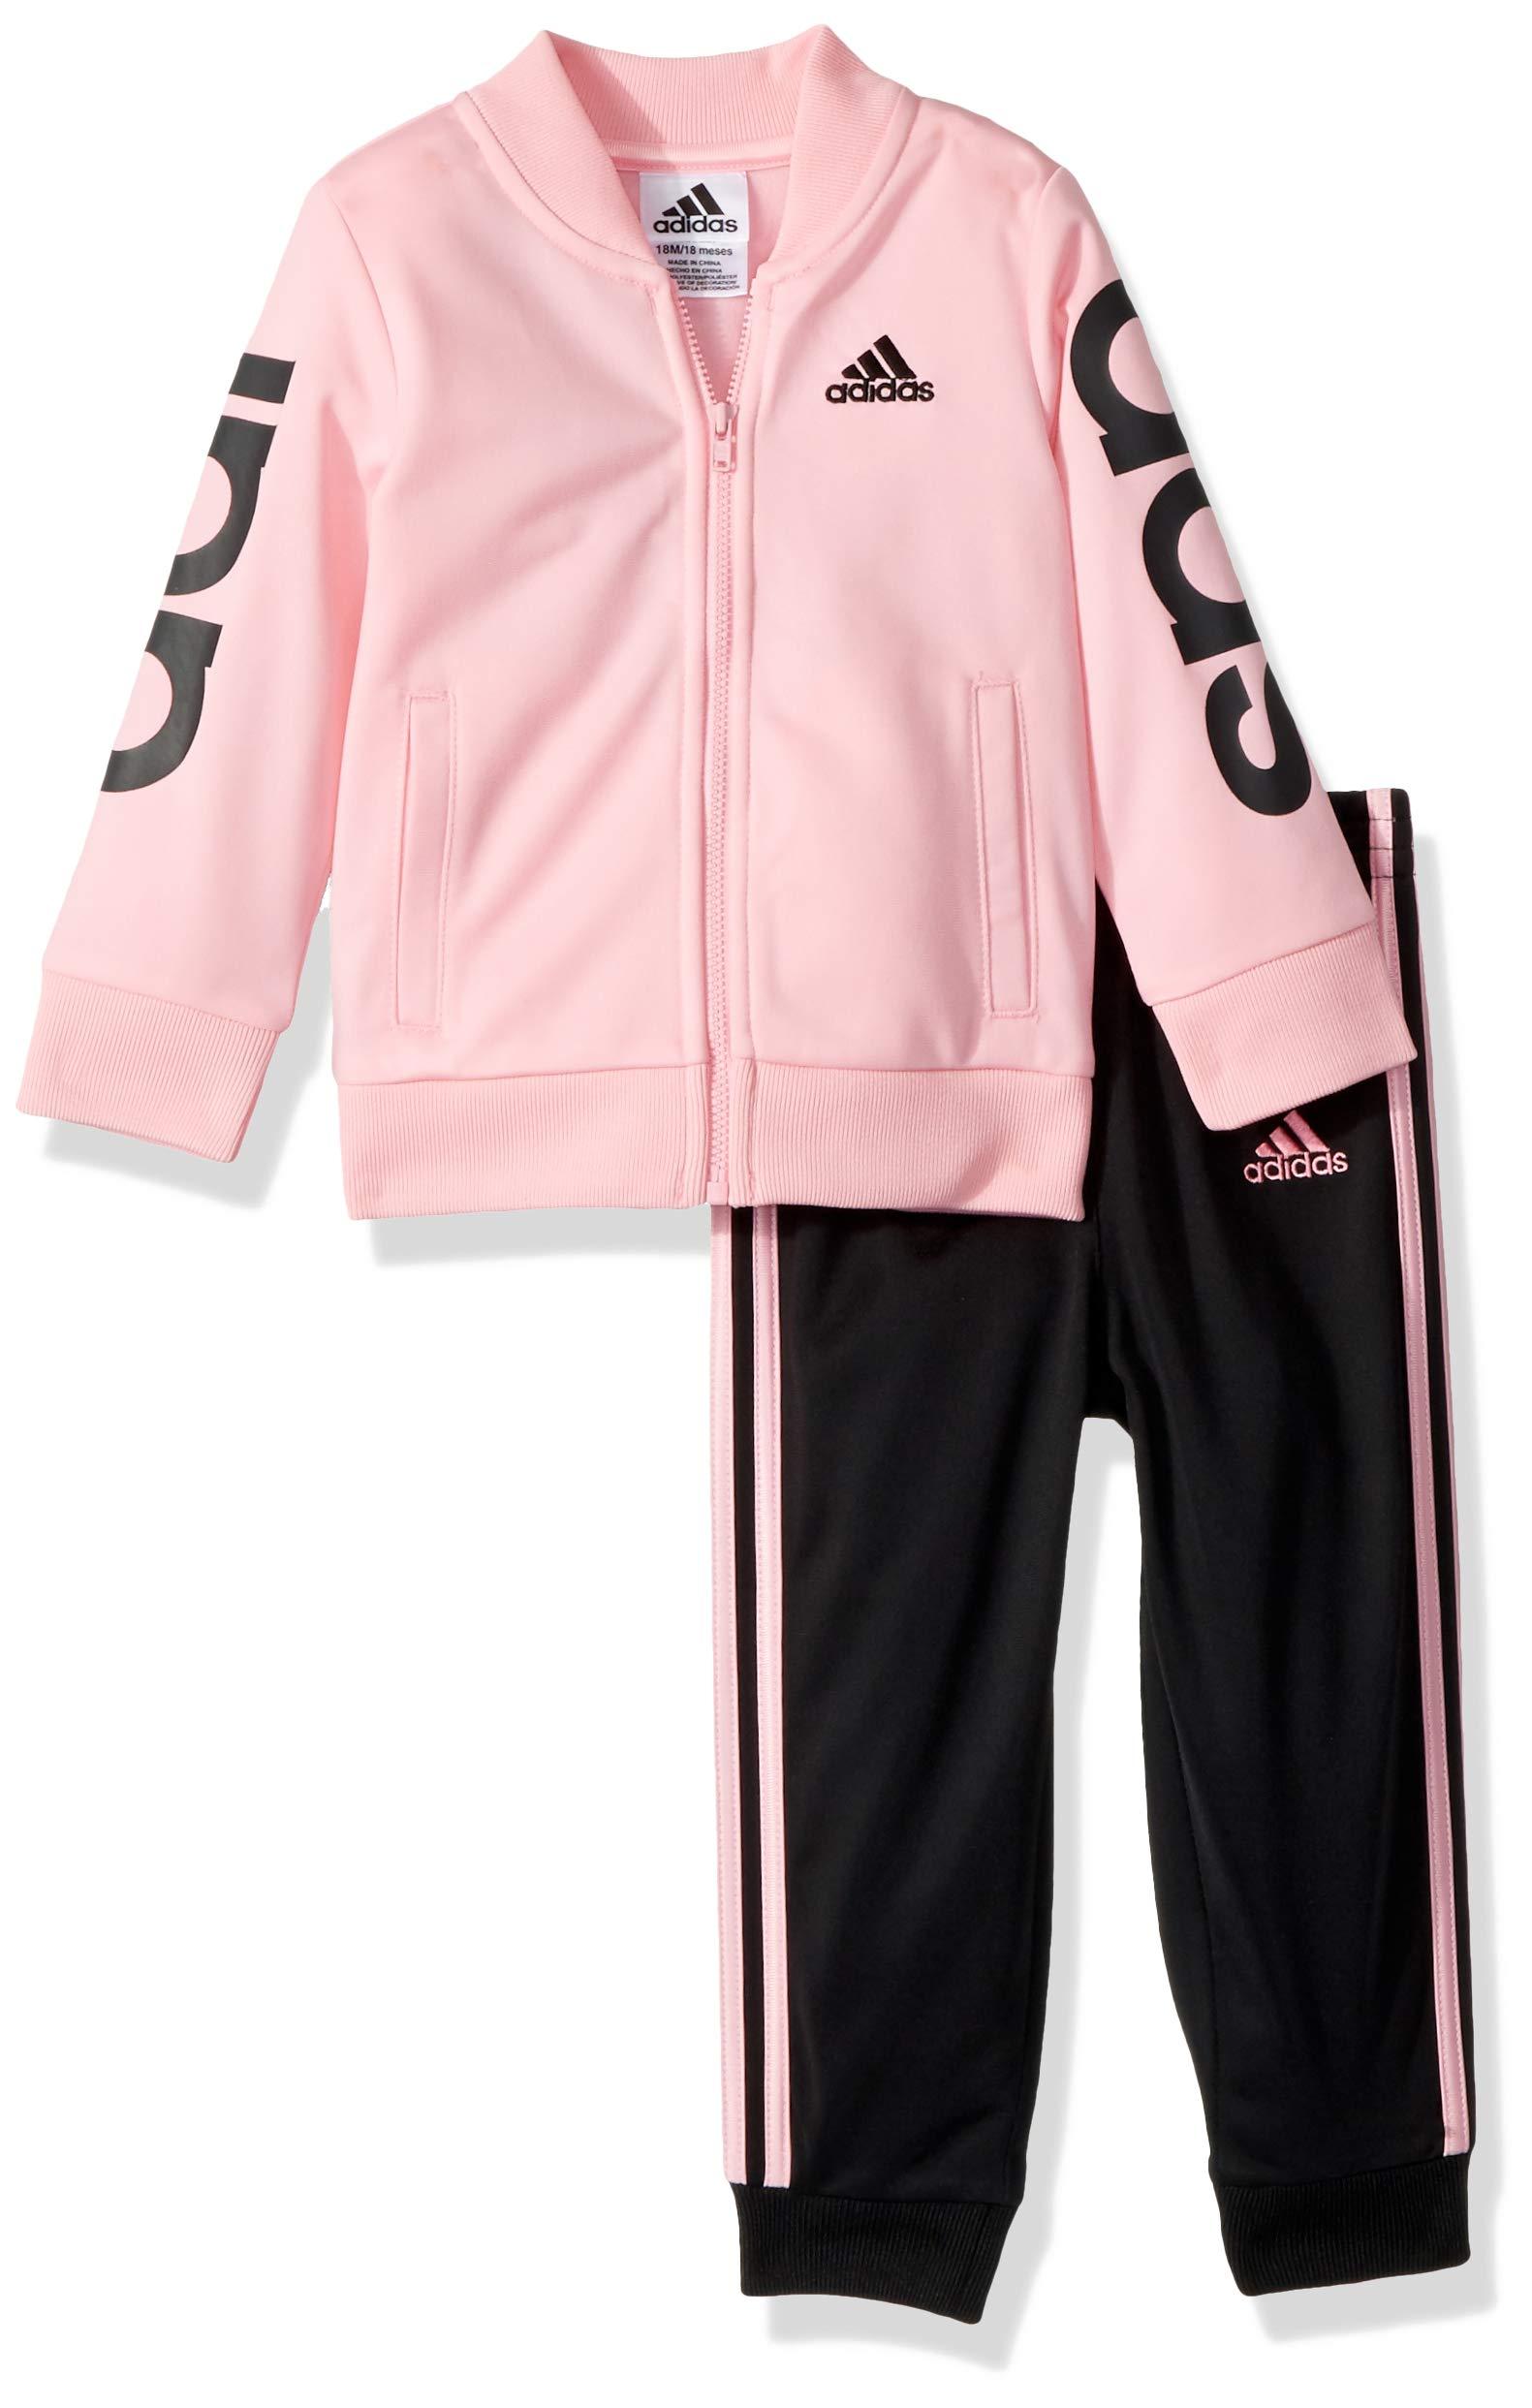 Galleon - Adidas Baby Girls Zip Jacket And Pant Set 08e2d9c73